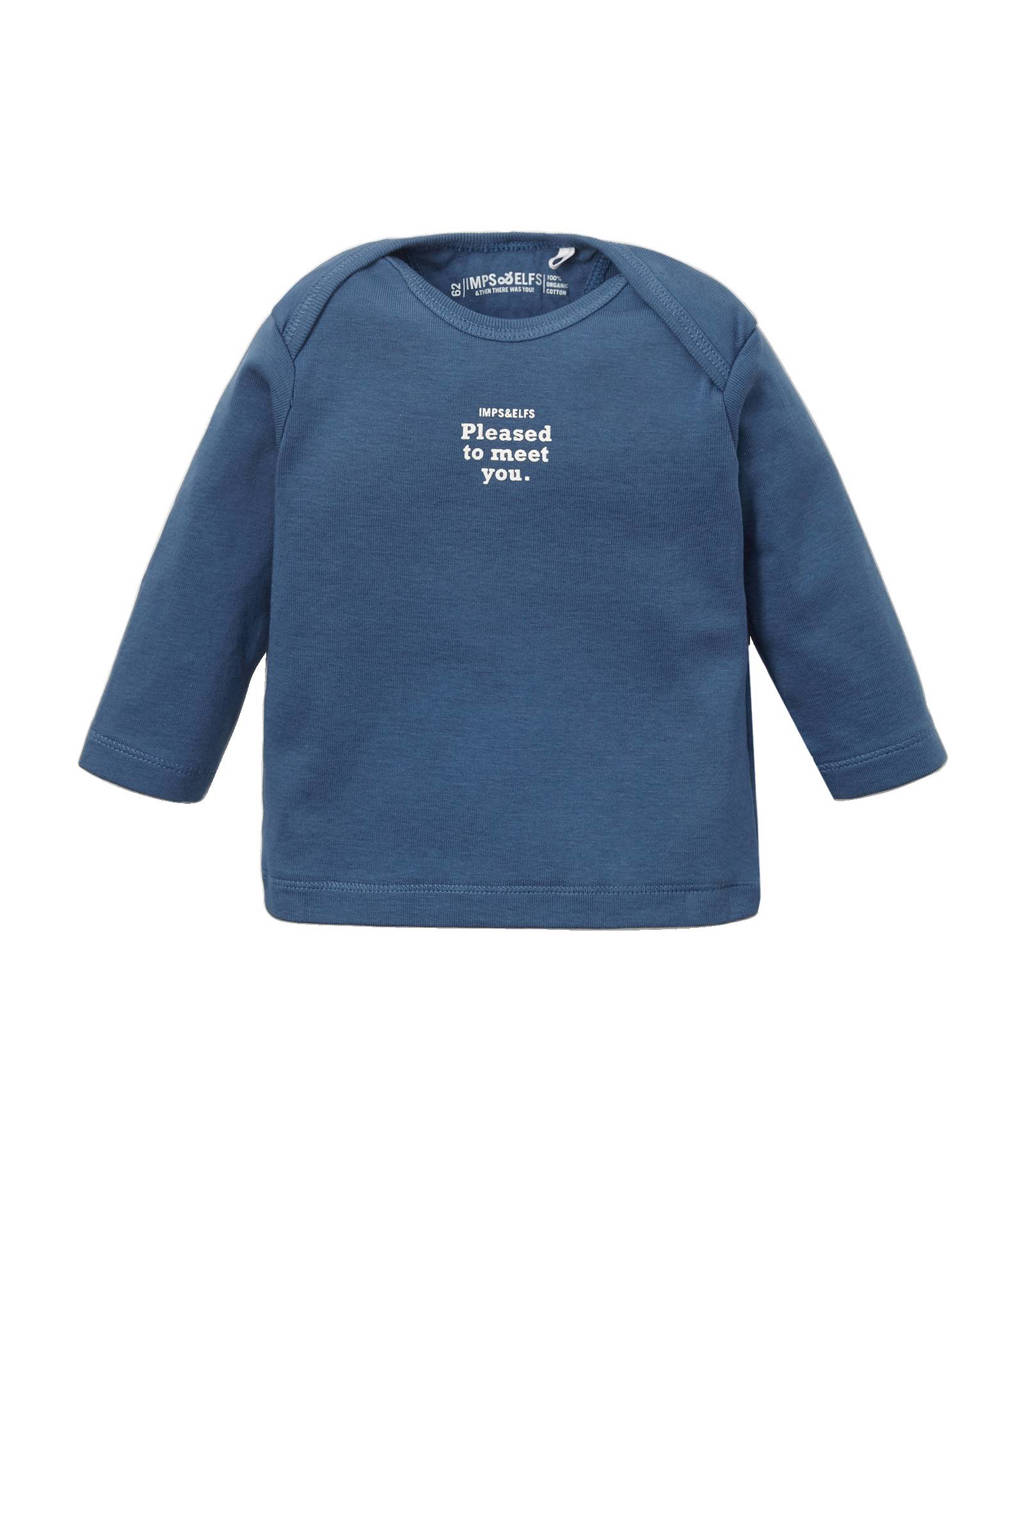 IMPS&ELFS baby newborn longsleeve, Blauw